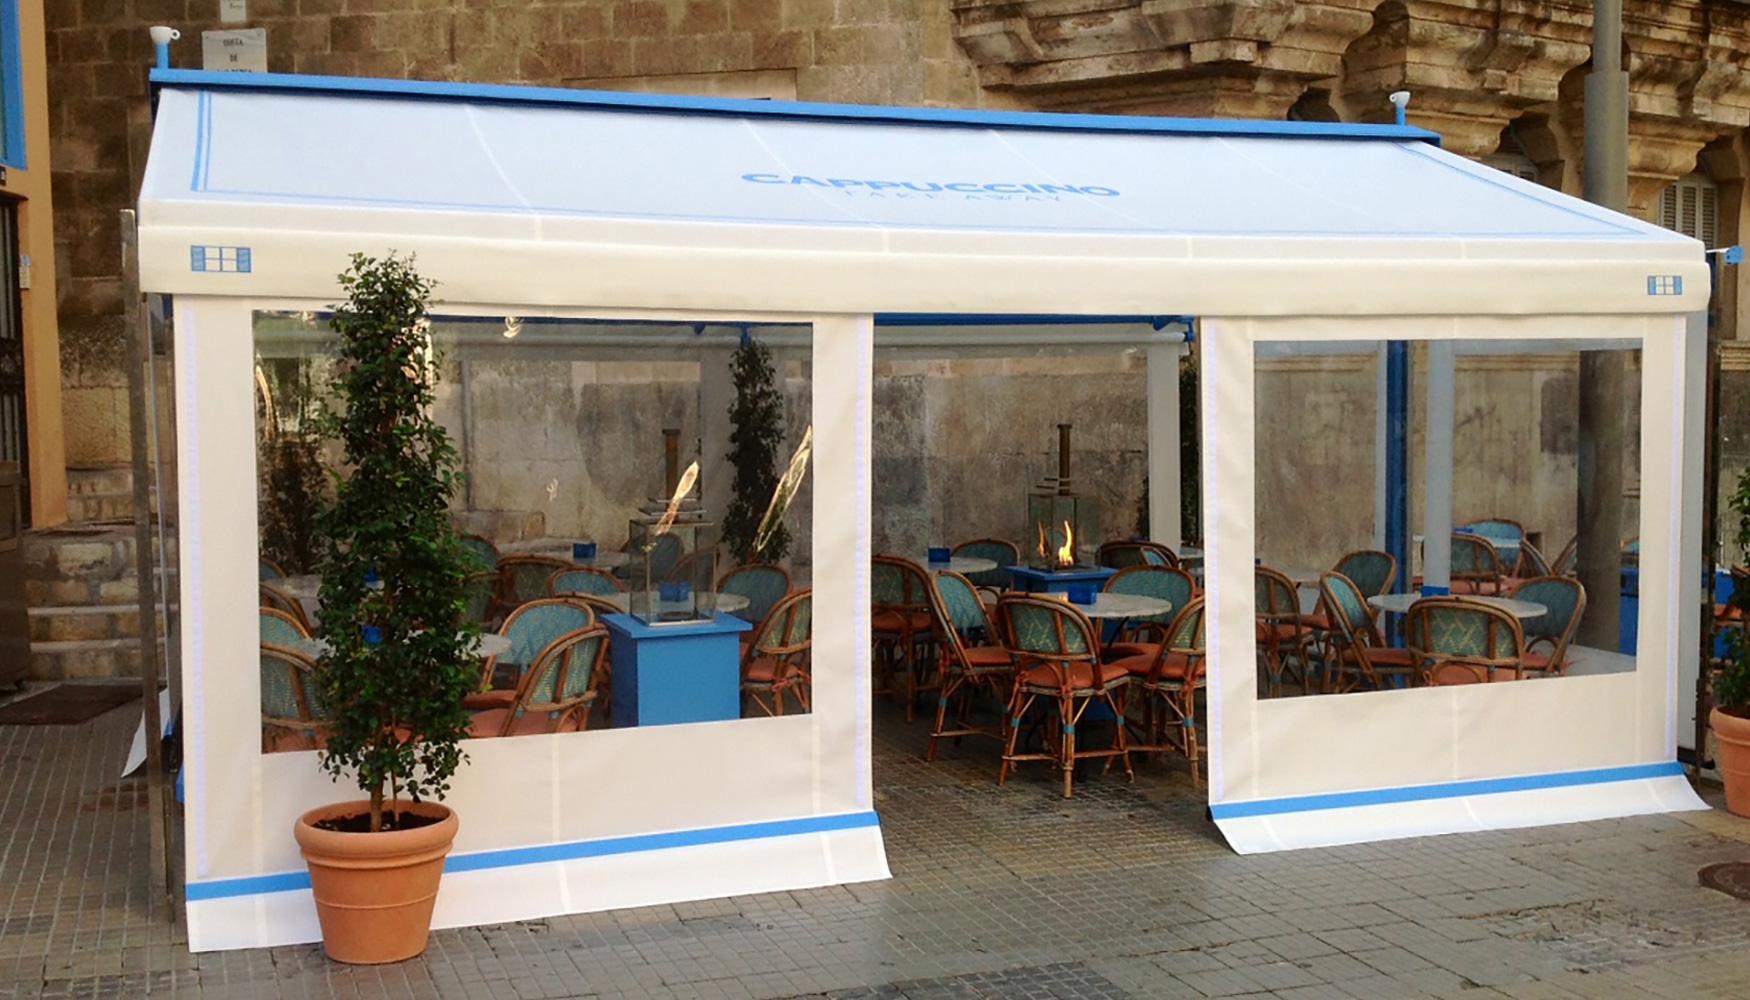 Toldos y parasoles de novelty para terrazas protecci n solar for Toldos laterales para terrazas